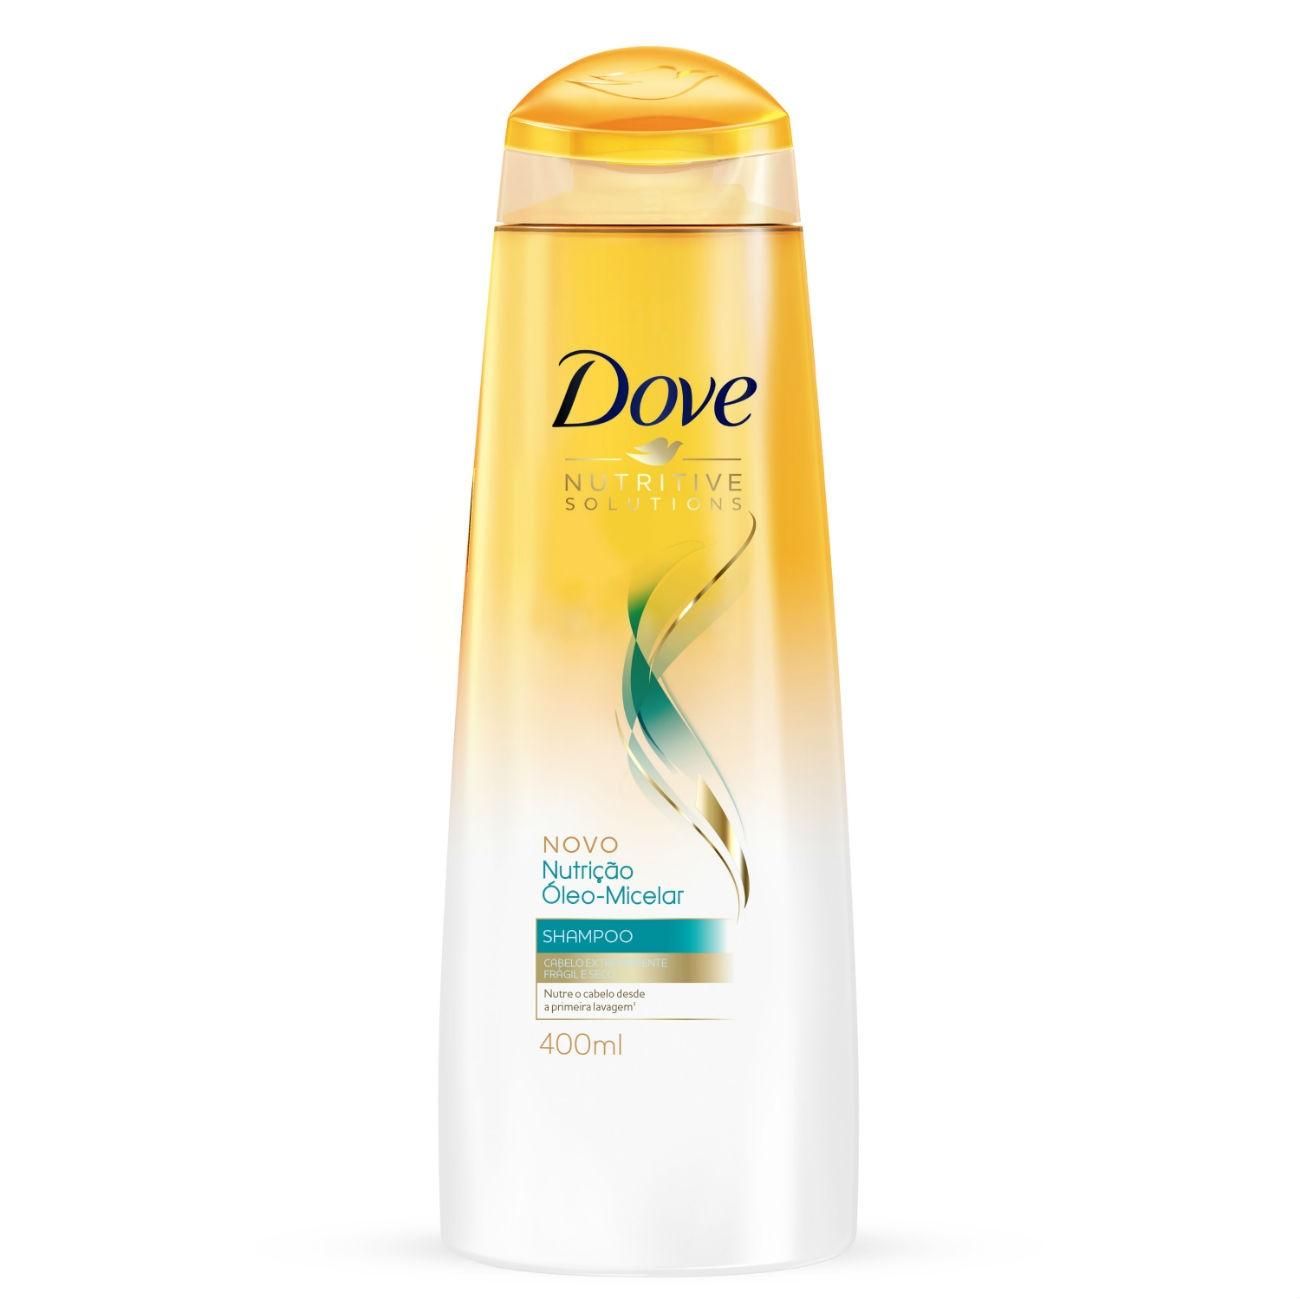 Shampoo Dove Nutrição Óleo-Micelar 400ml